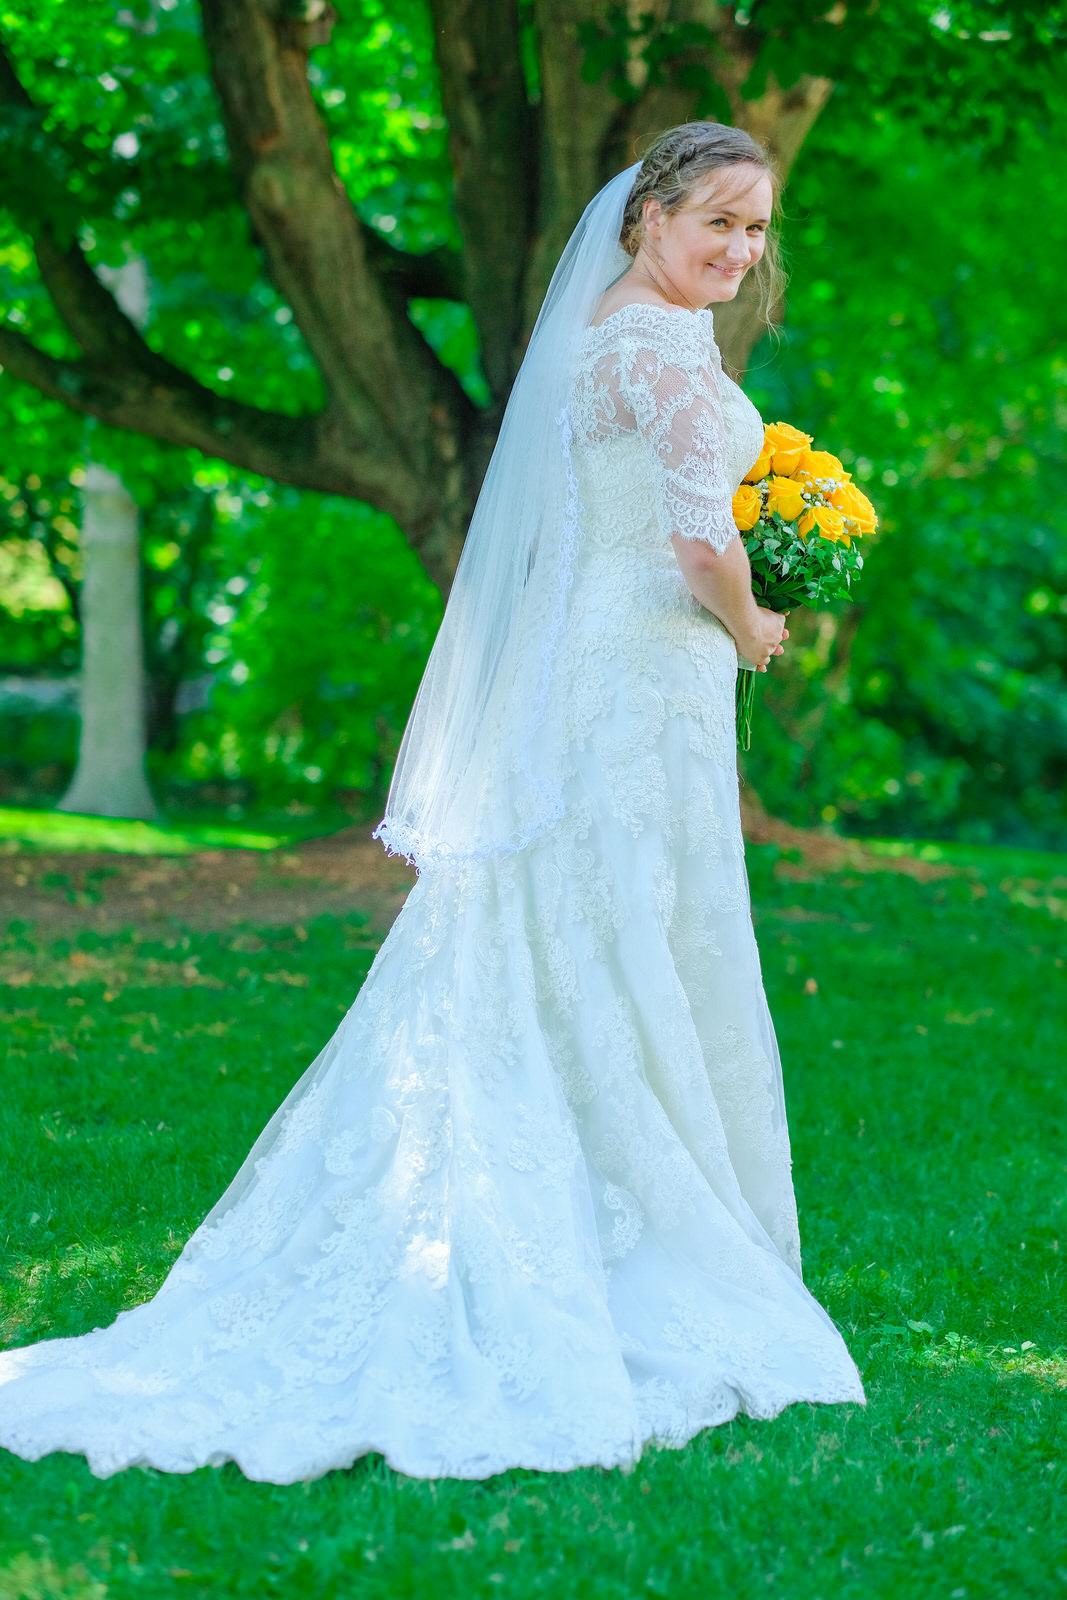 candid-vermont-wedding-photography-460.jpg